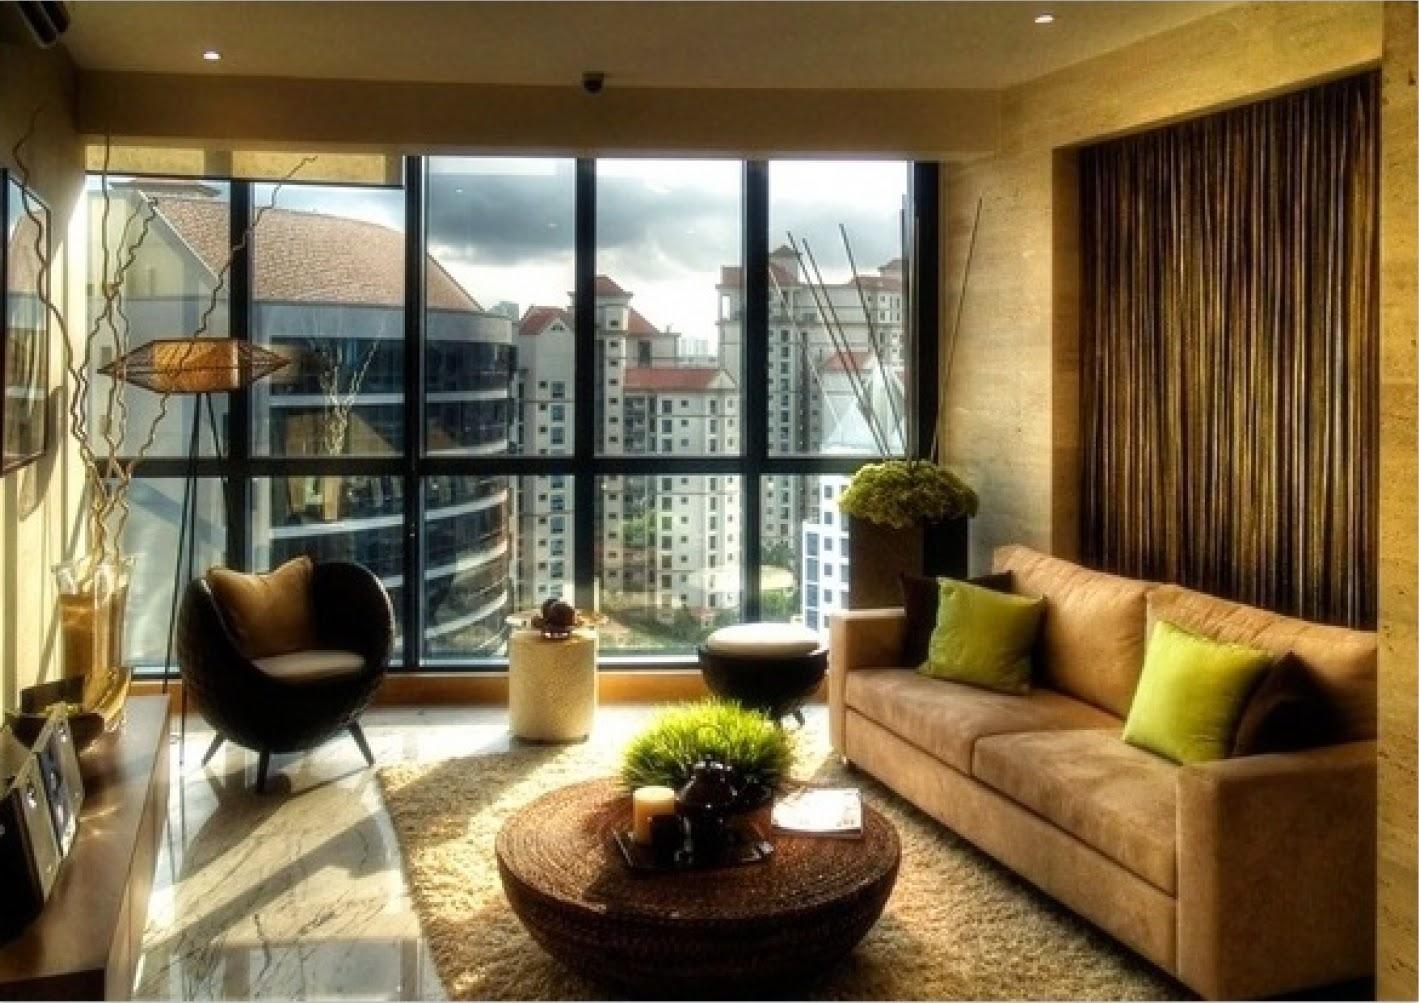 Interior Design Ideas for Small Apartment Living Rooms